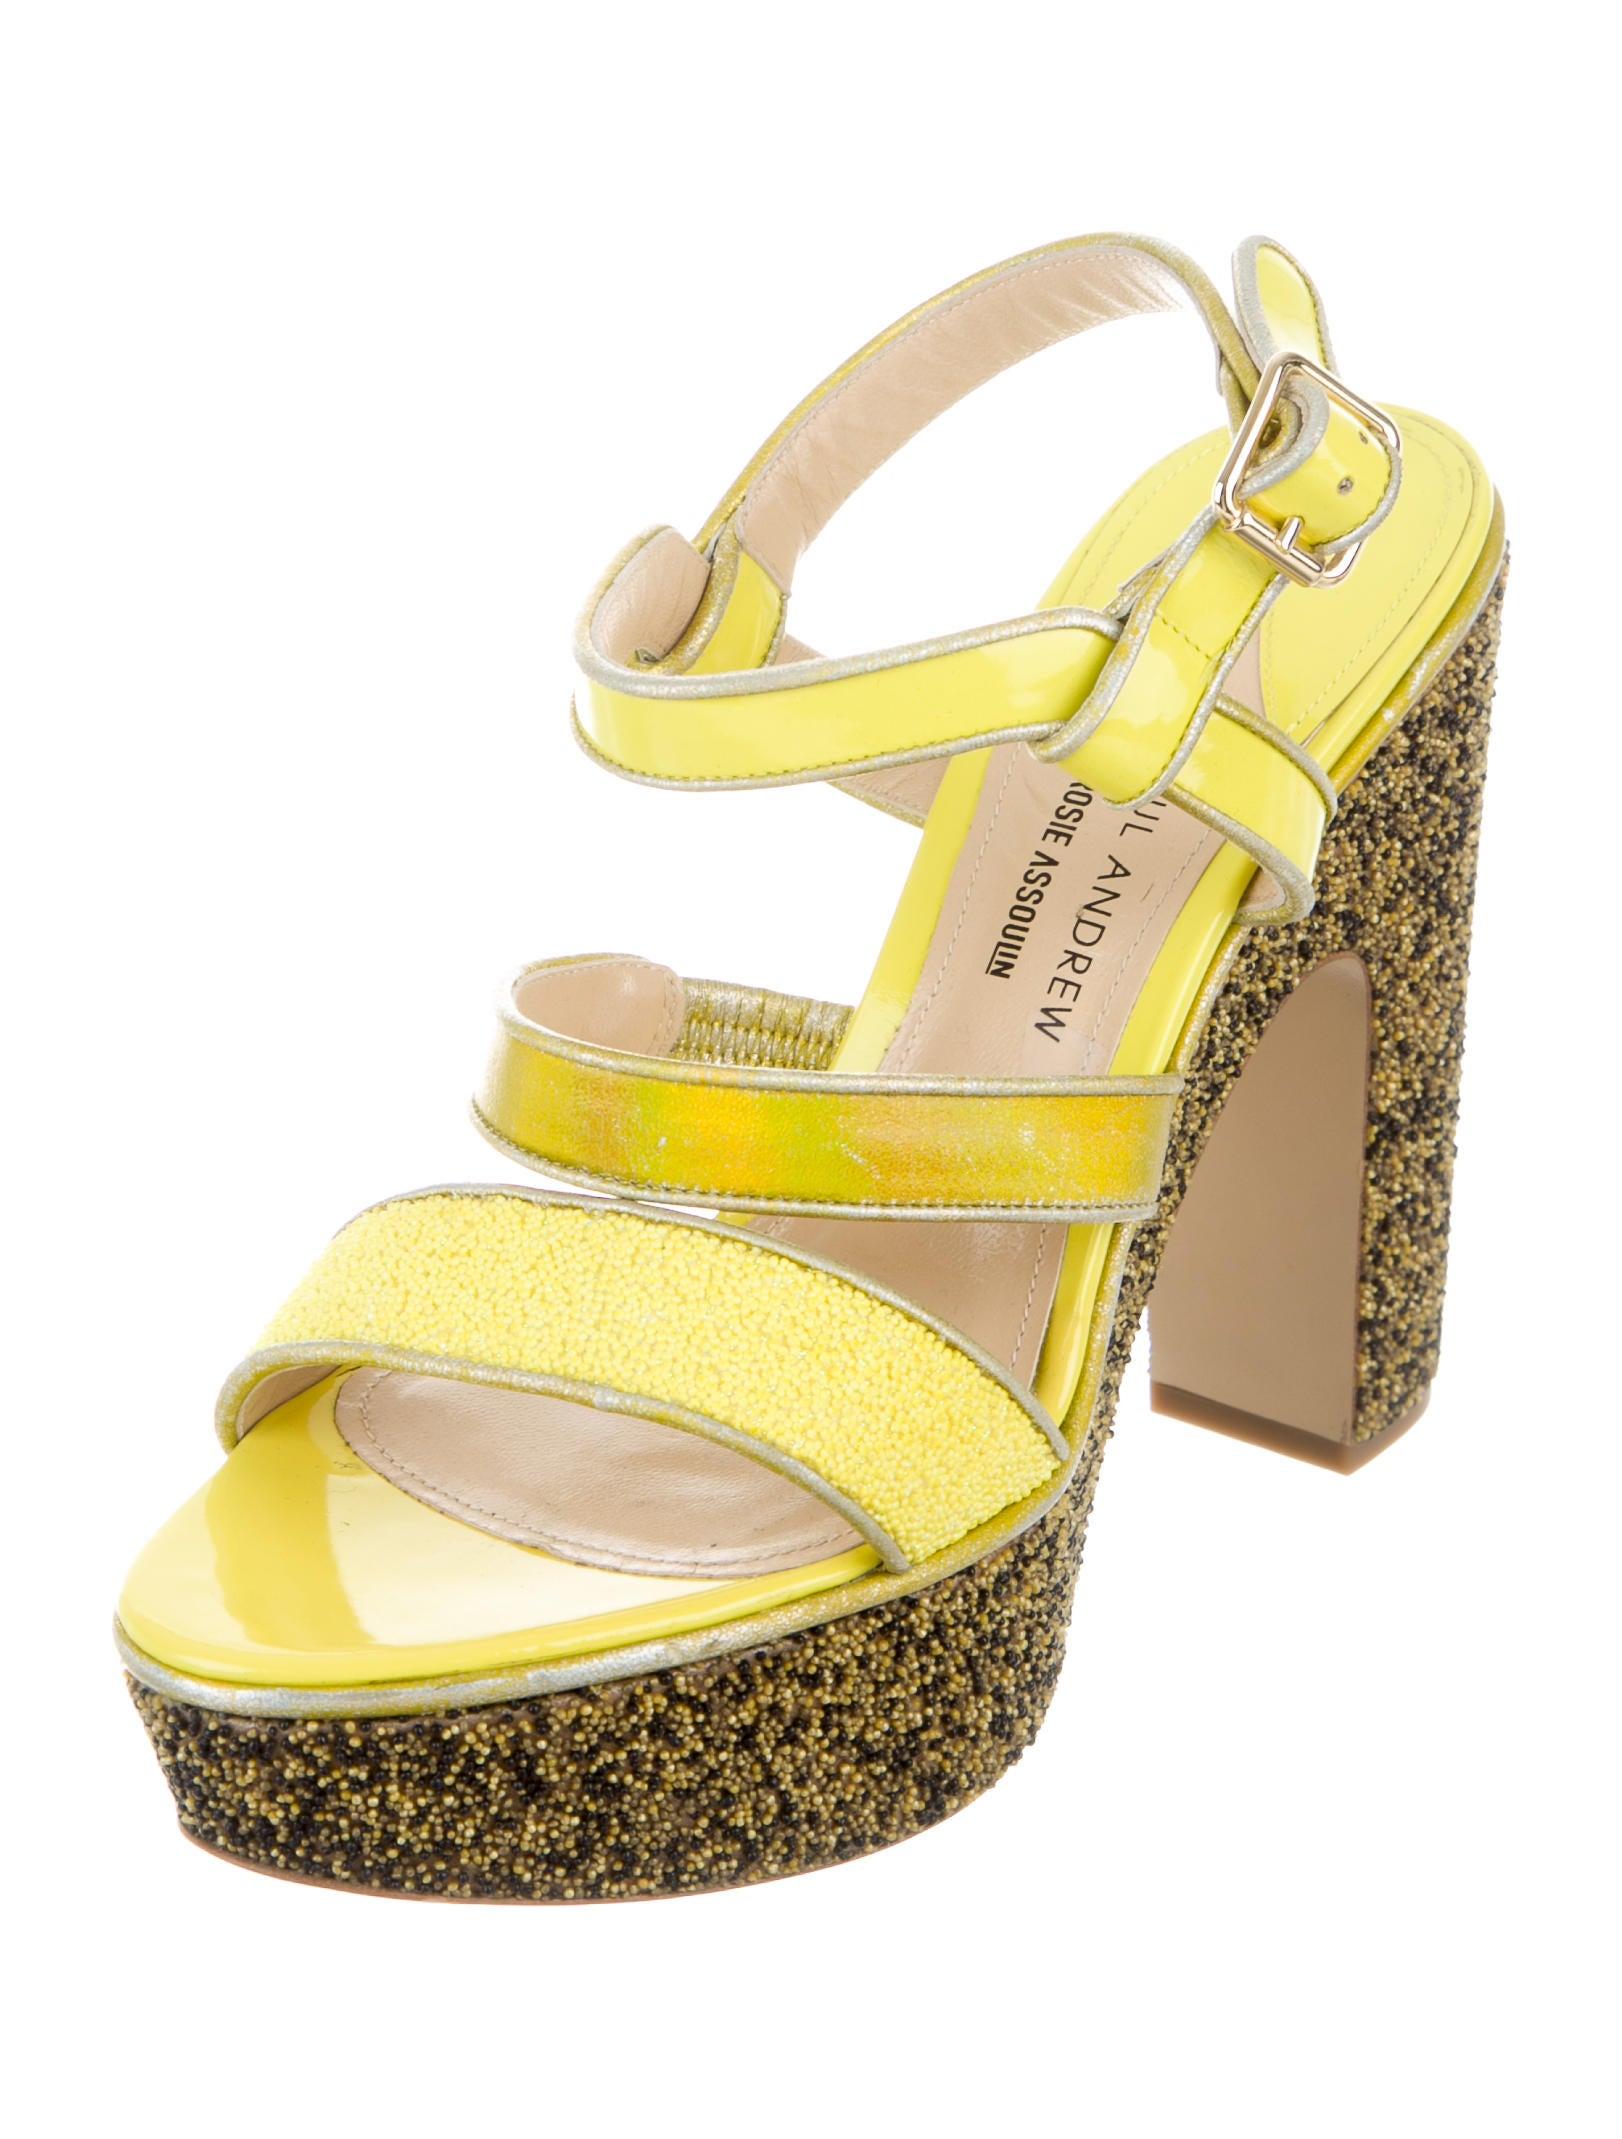 2014 unisex cheap online websites Rosie Assoulin x Paul Andrew Patent Platform Sandals choice online 0jQS62